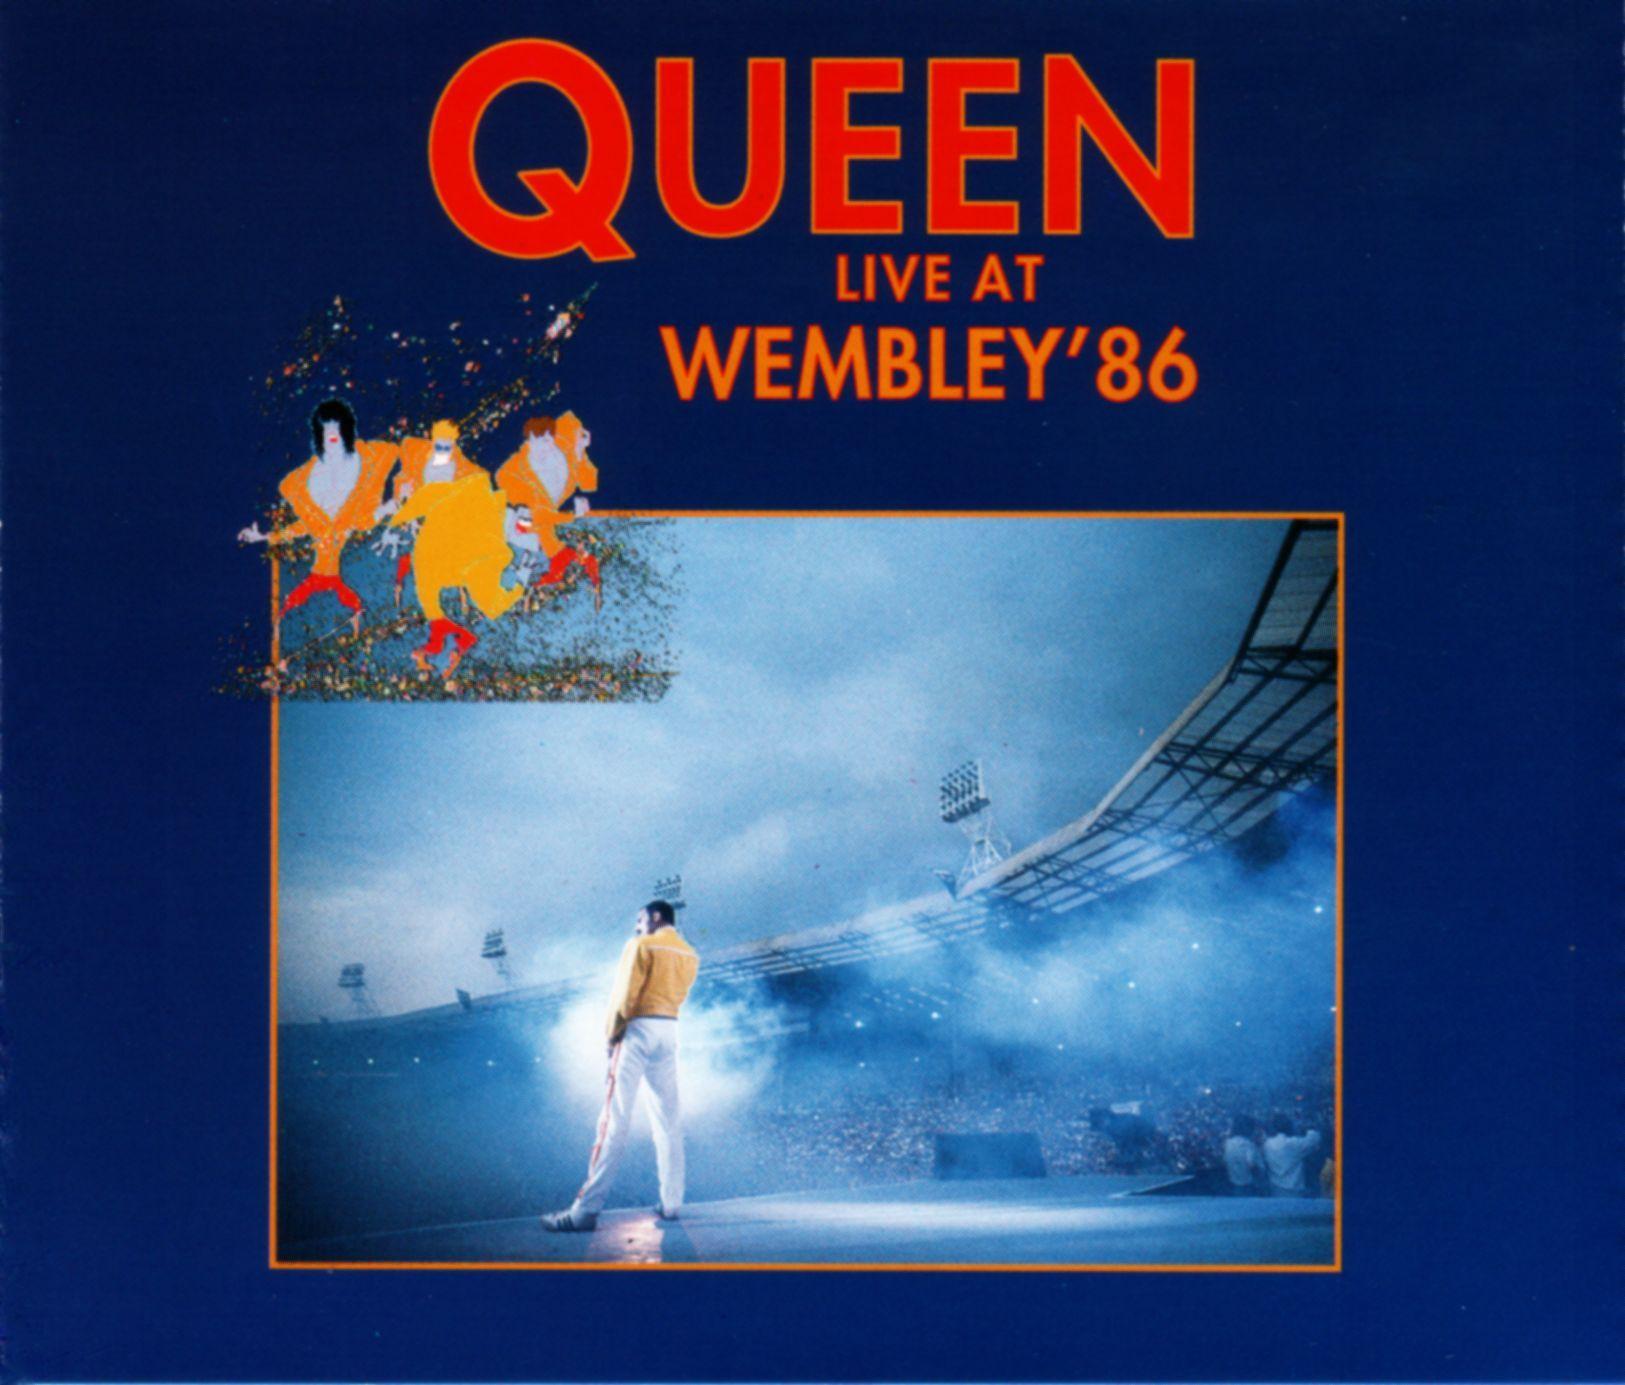 Queen - Live At Wembley Stadium 25th Anniversary album cover